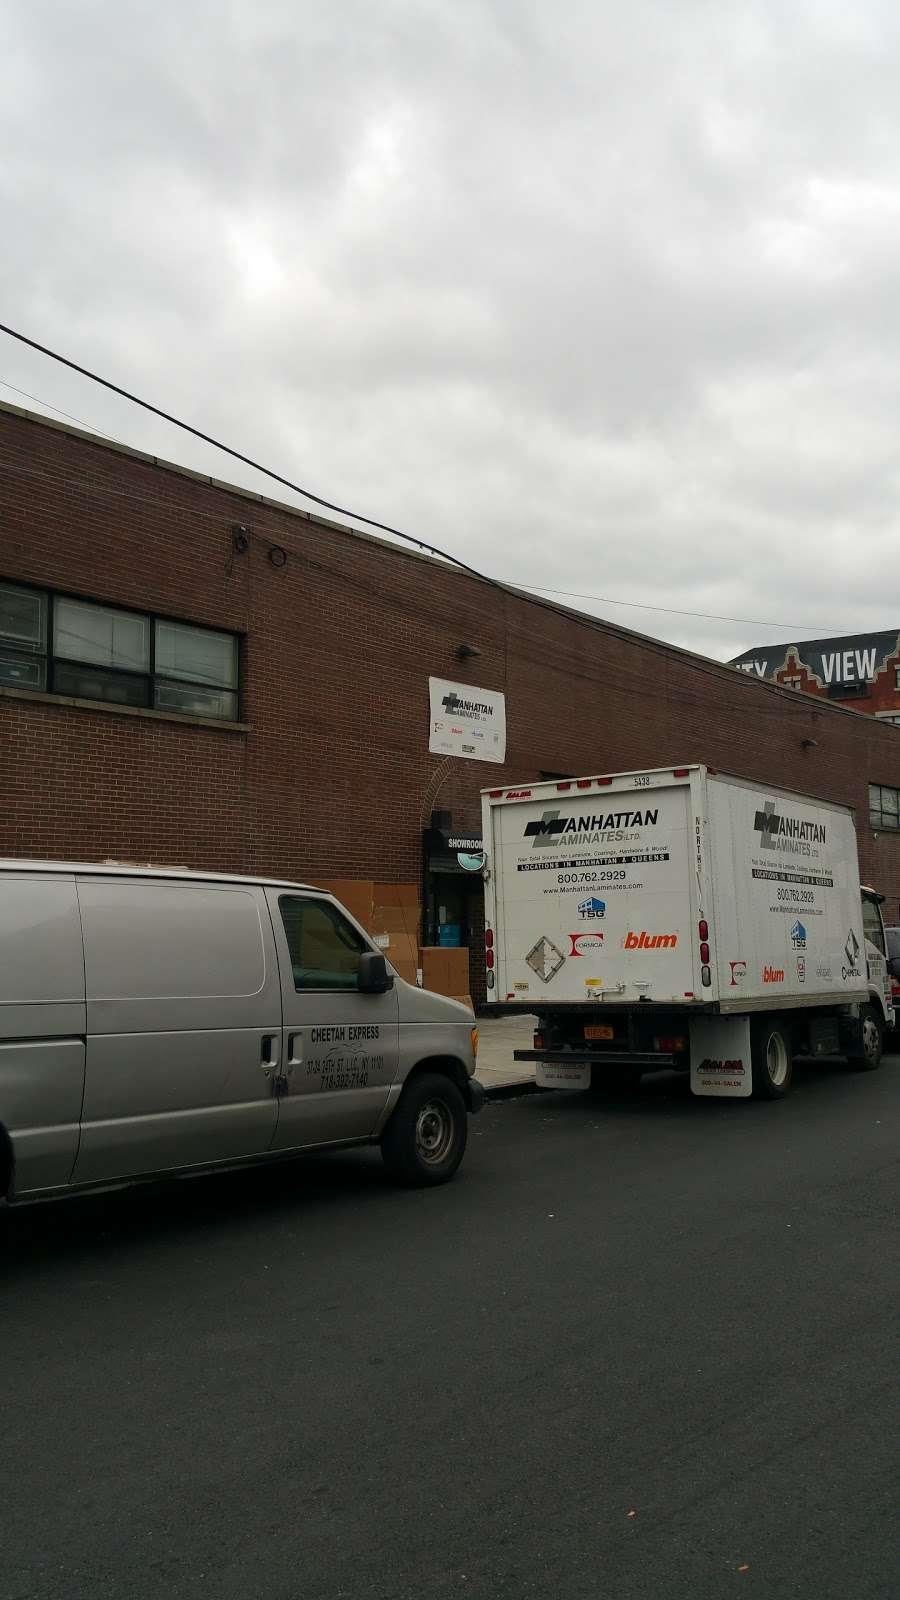 Manhattan Laminates - store  | Photo 3 of 5 | Address: 51-15 35th St, Long Island City, NY 11101, USA | Phone: (800) 762-2929